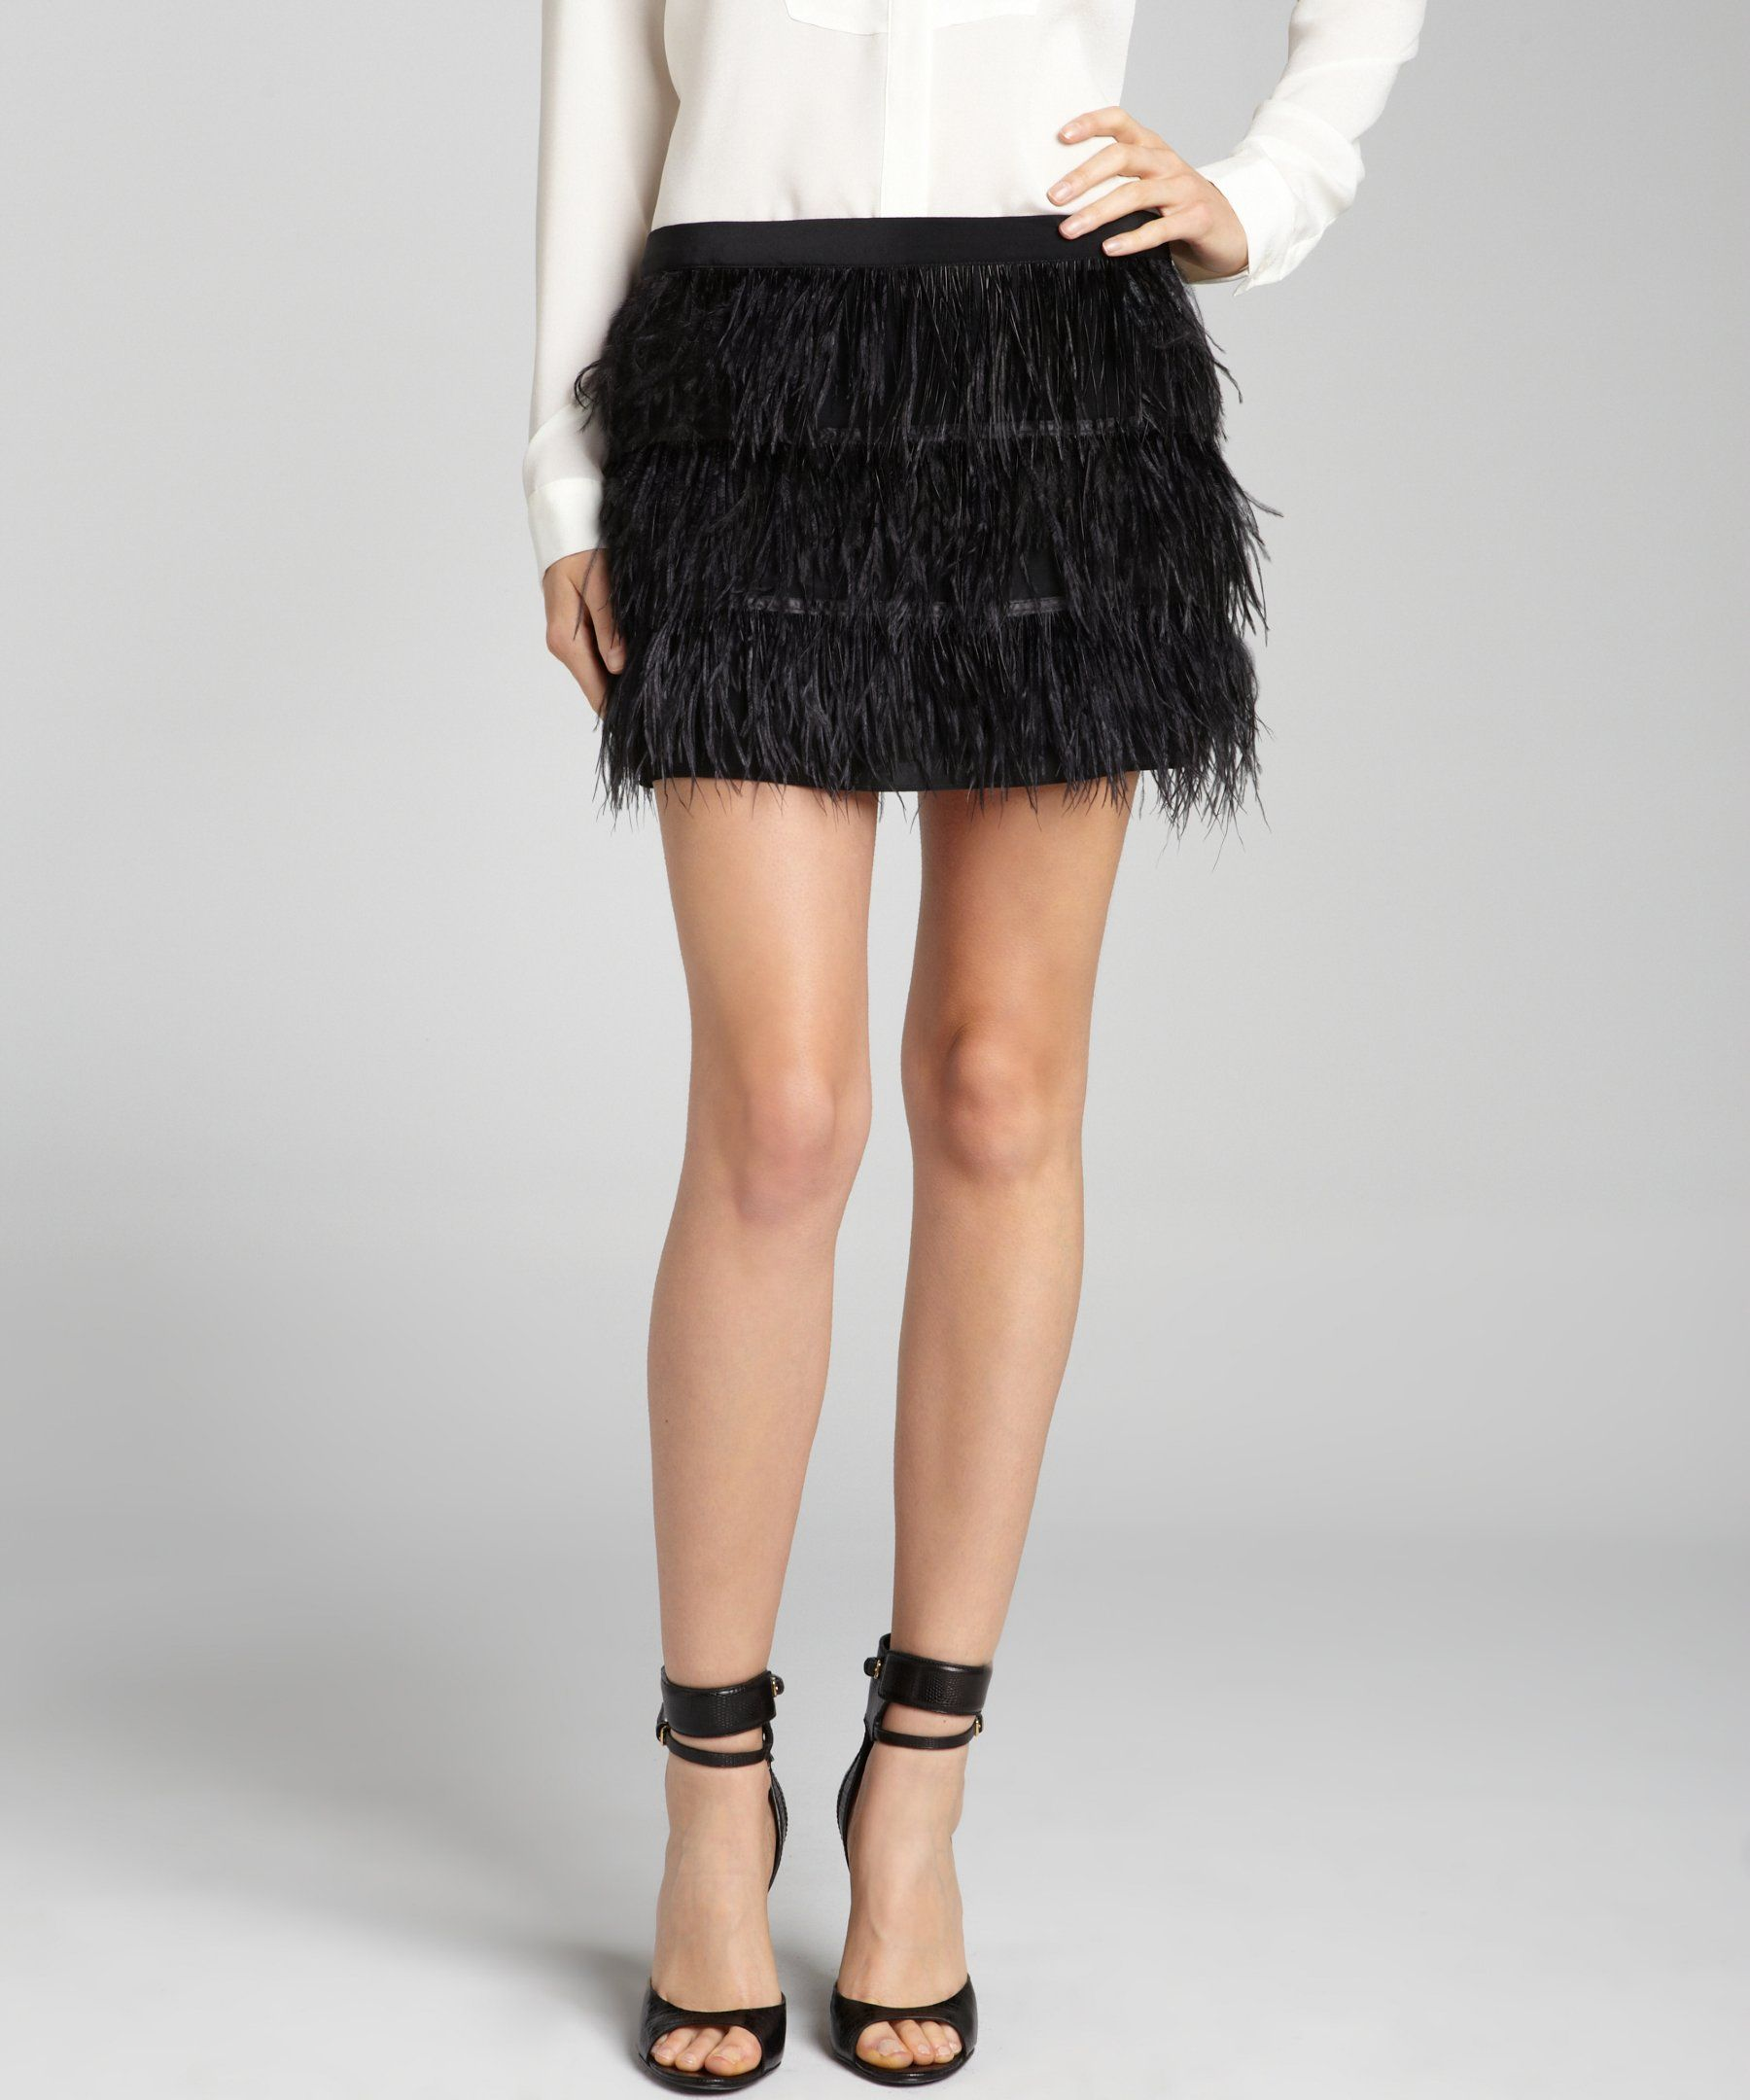 Wyatt black silk and ostrich feather mini skirt | BLUEFLY up to 70% off designer brands